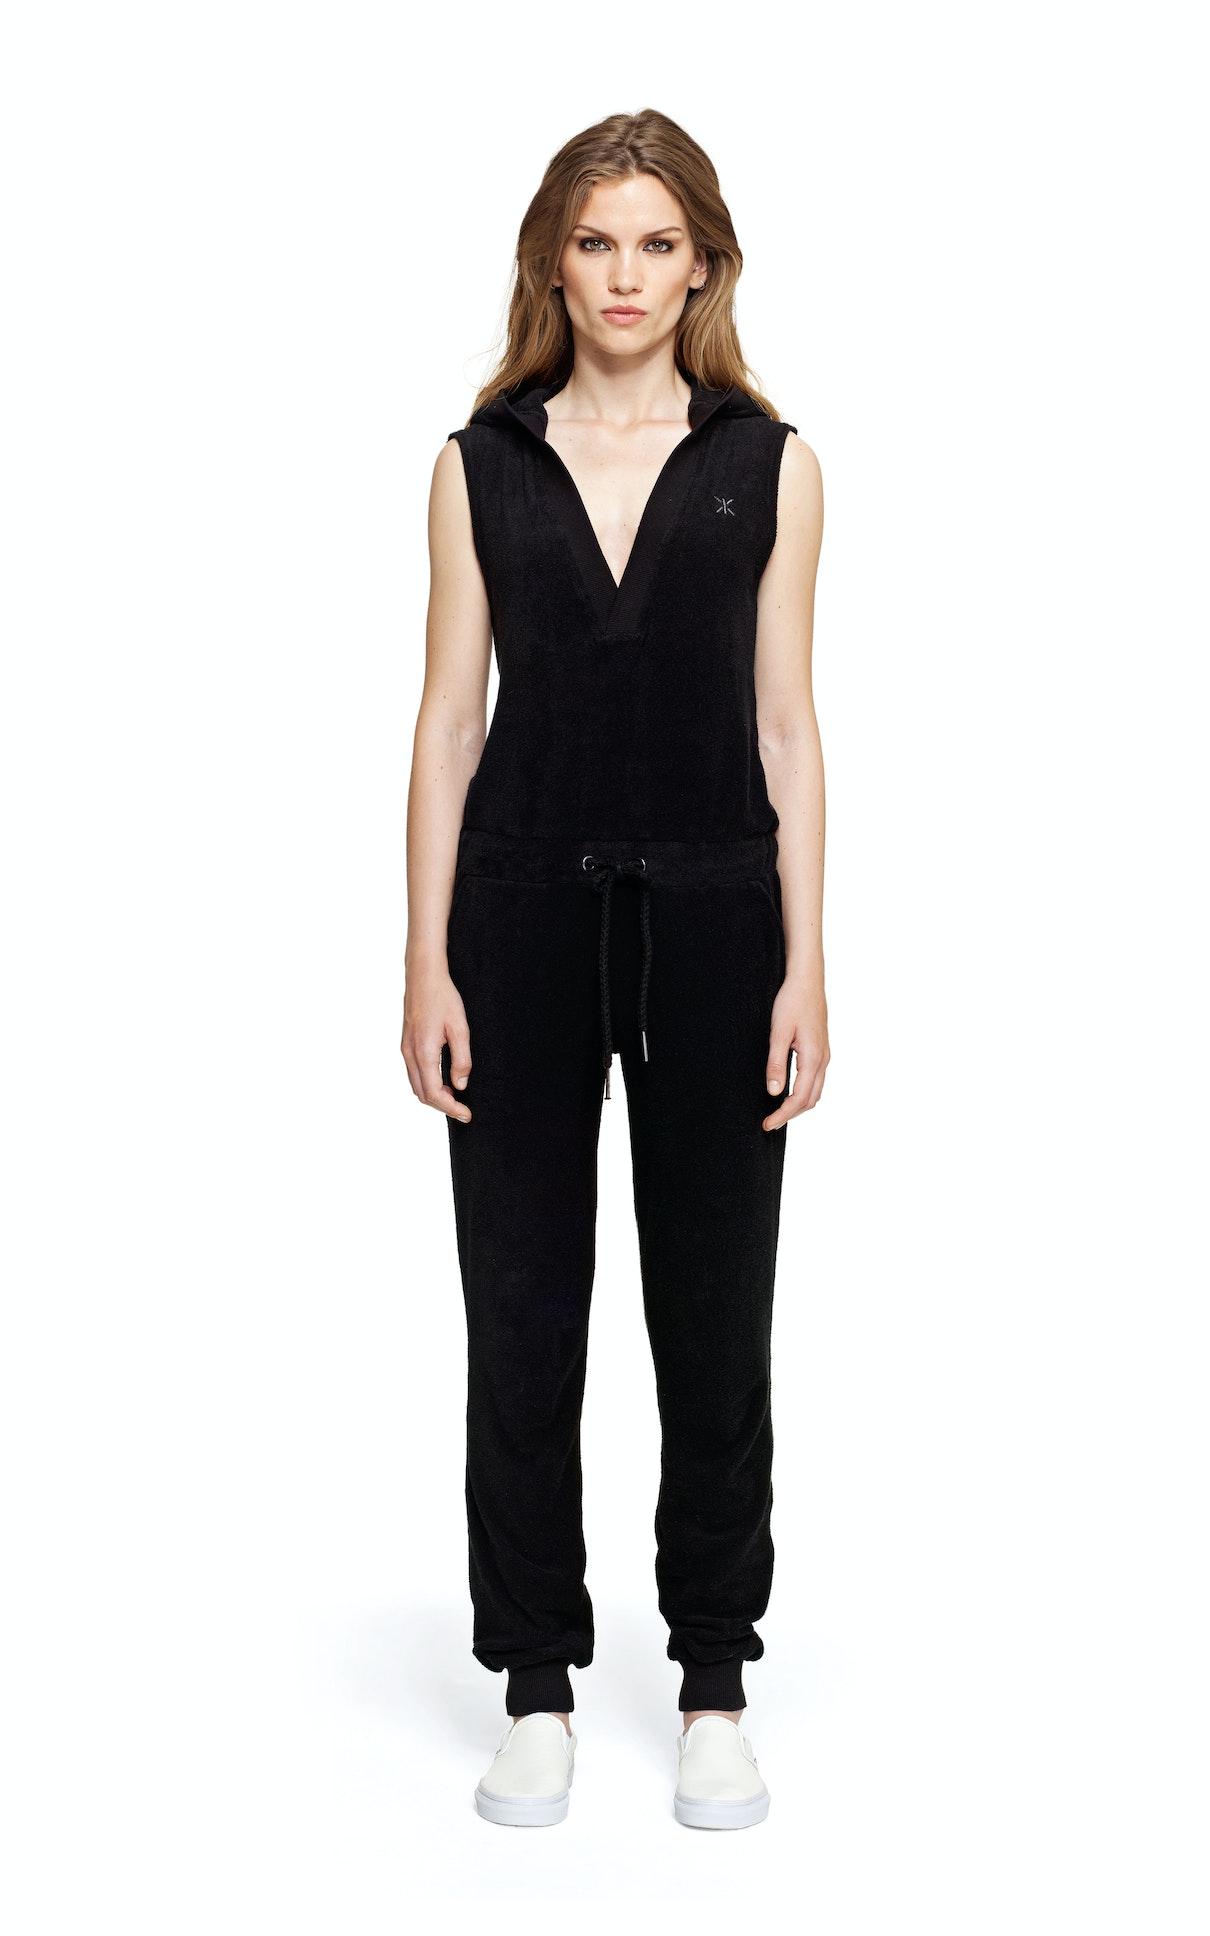 collected jumpsuit noir combinaison onepiece fr. Black Bedroom Furniture Sets. Home Design Ideas